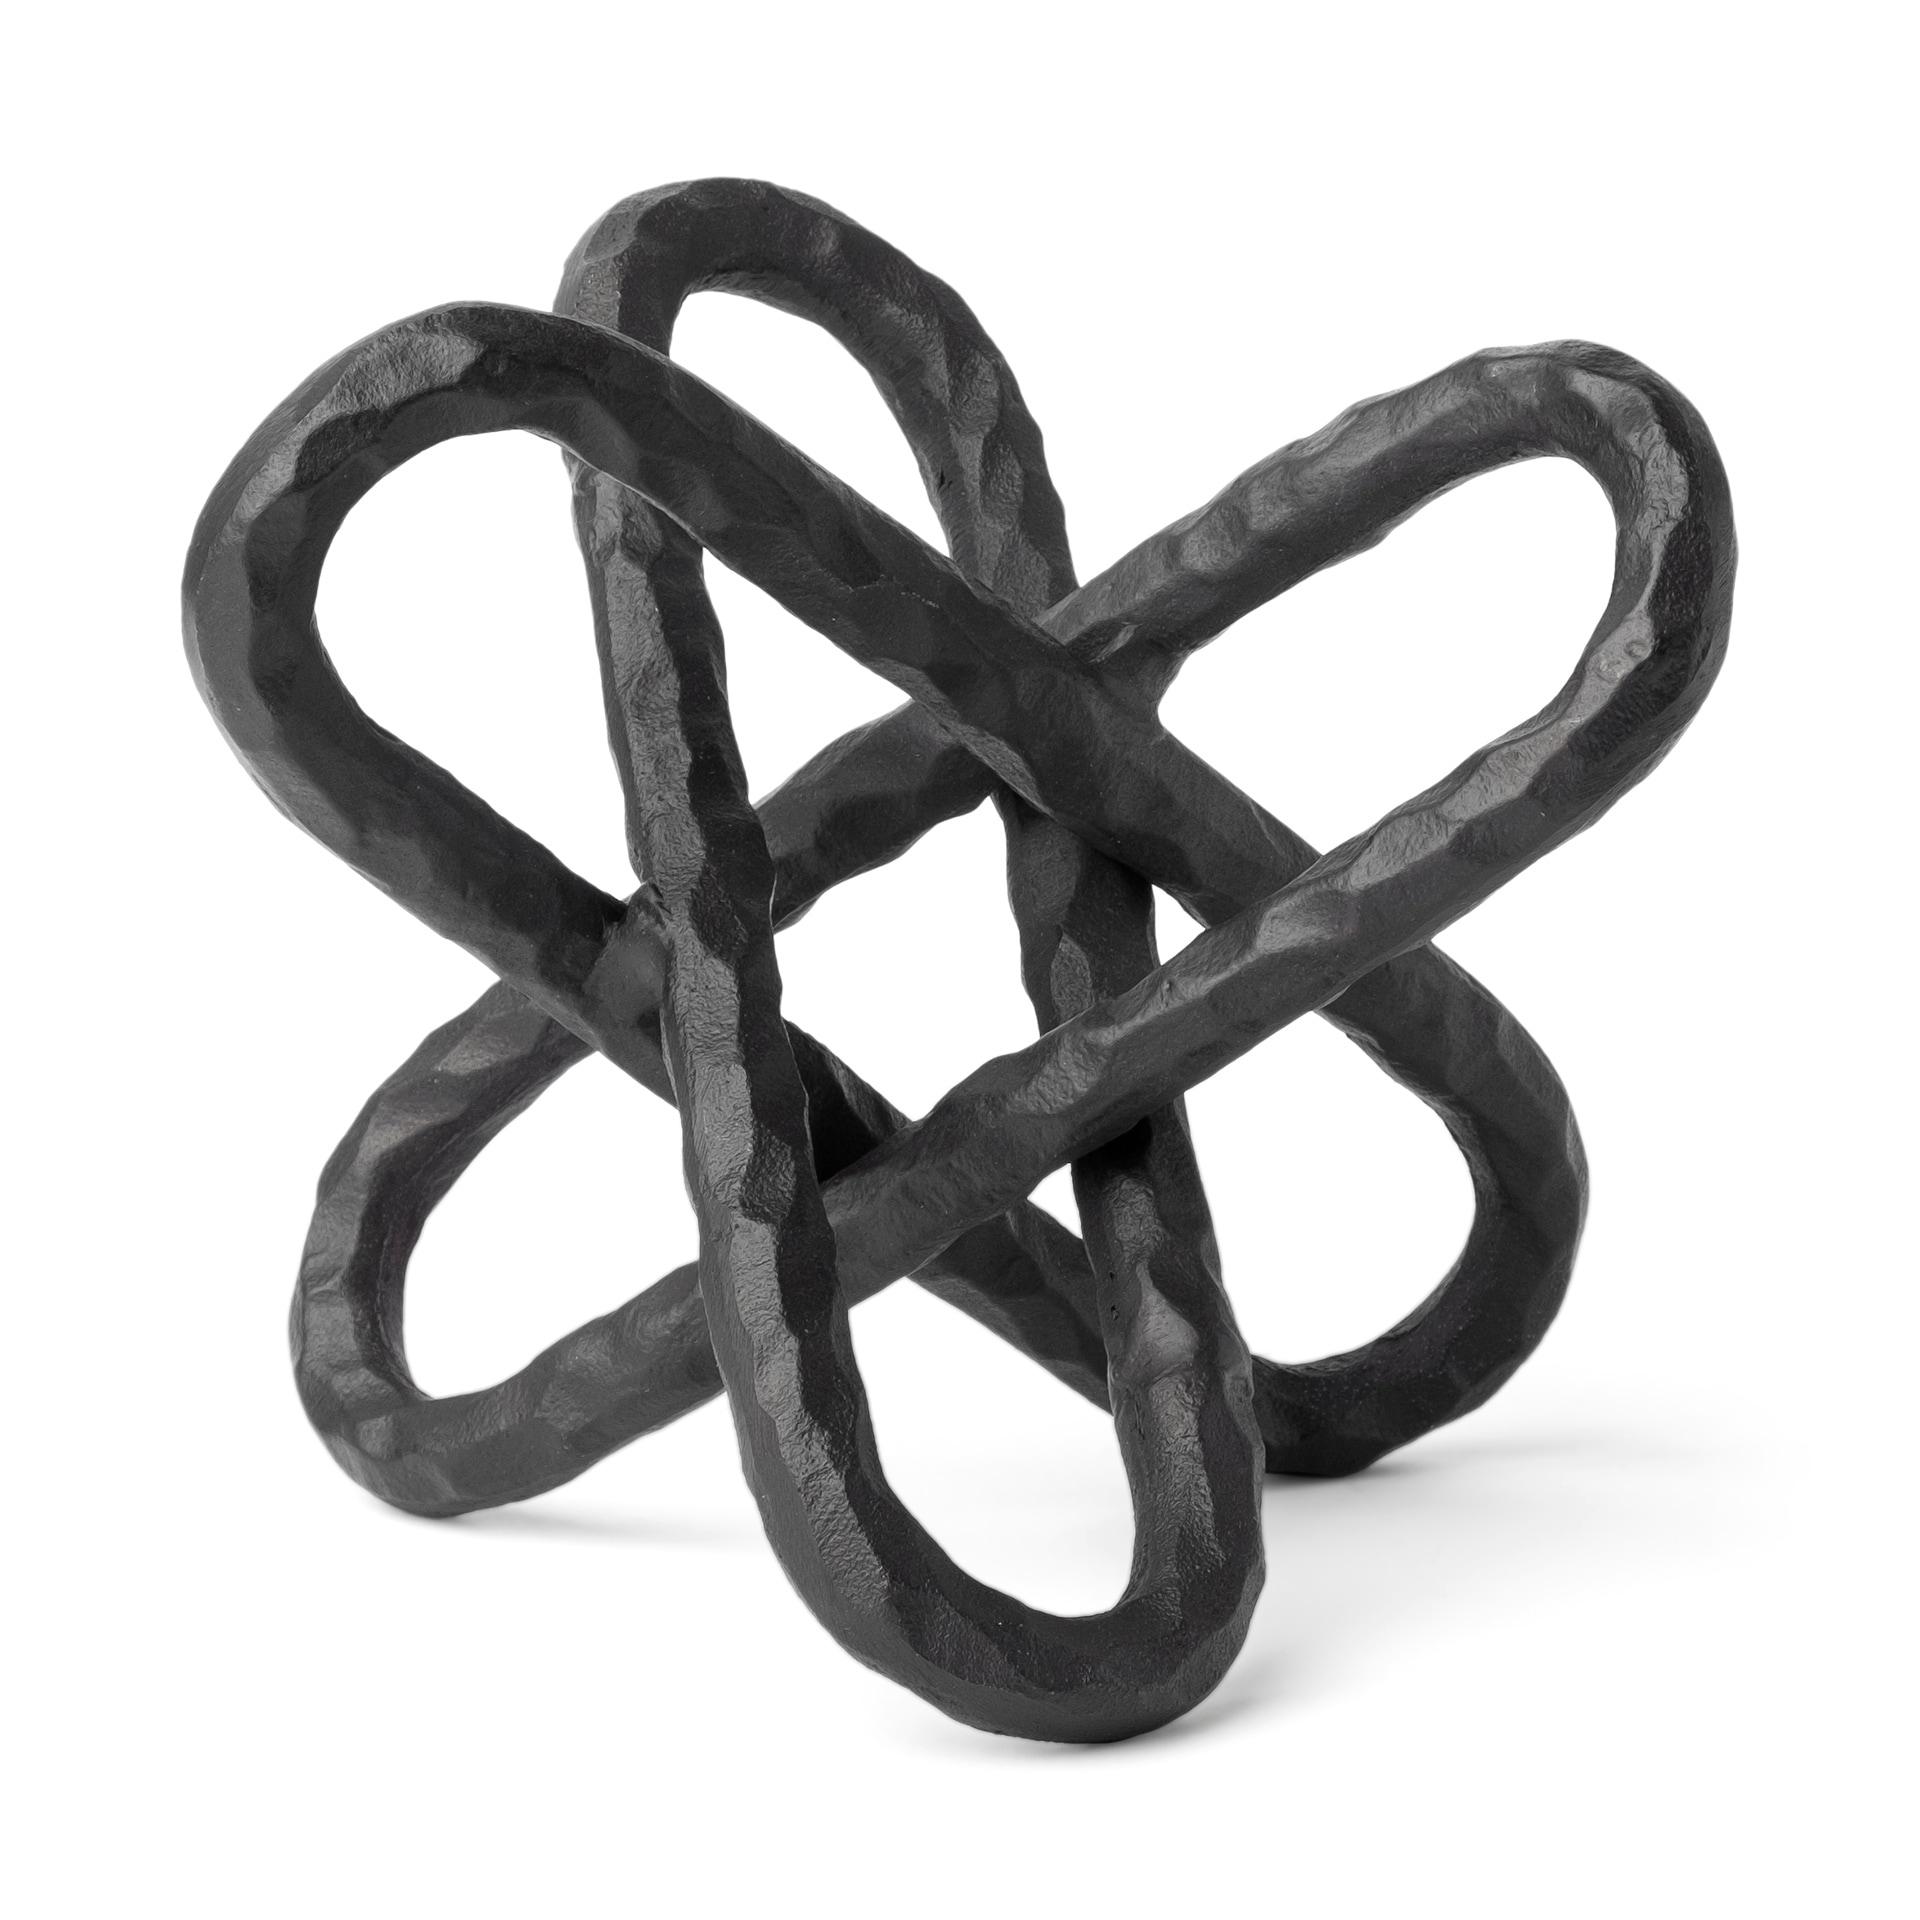 Mercana Wilhelm II (Black) L Decorative Object